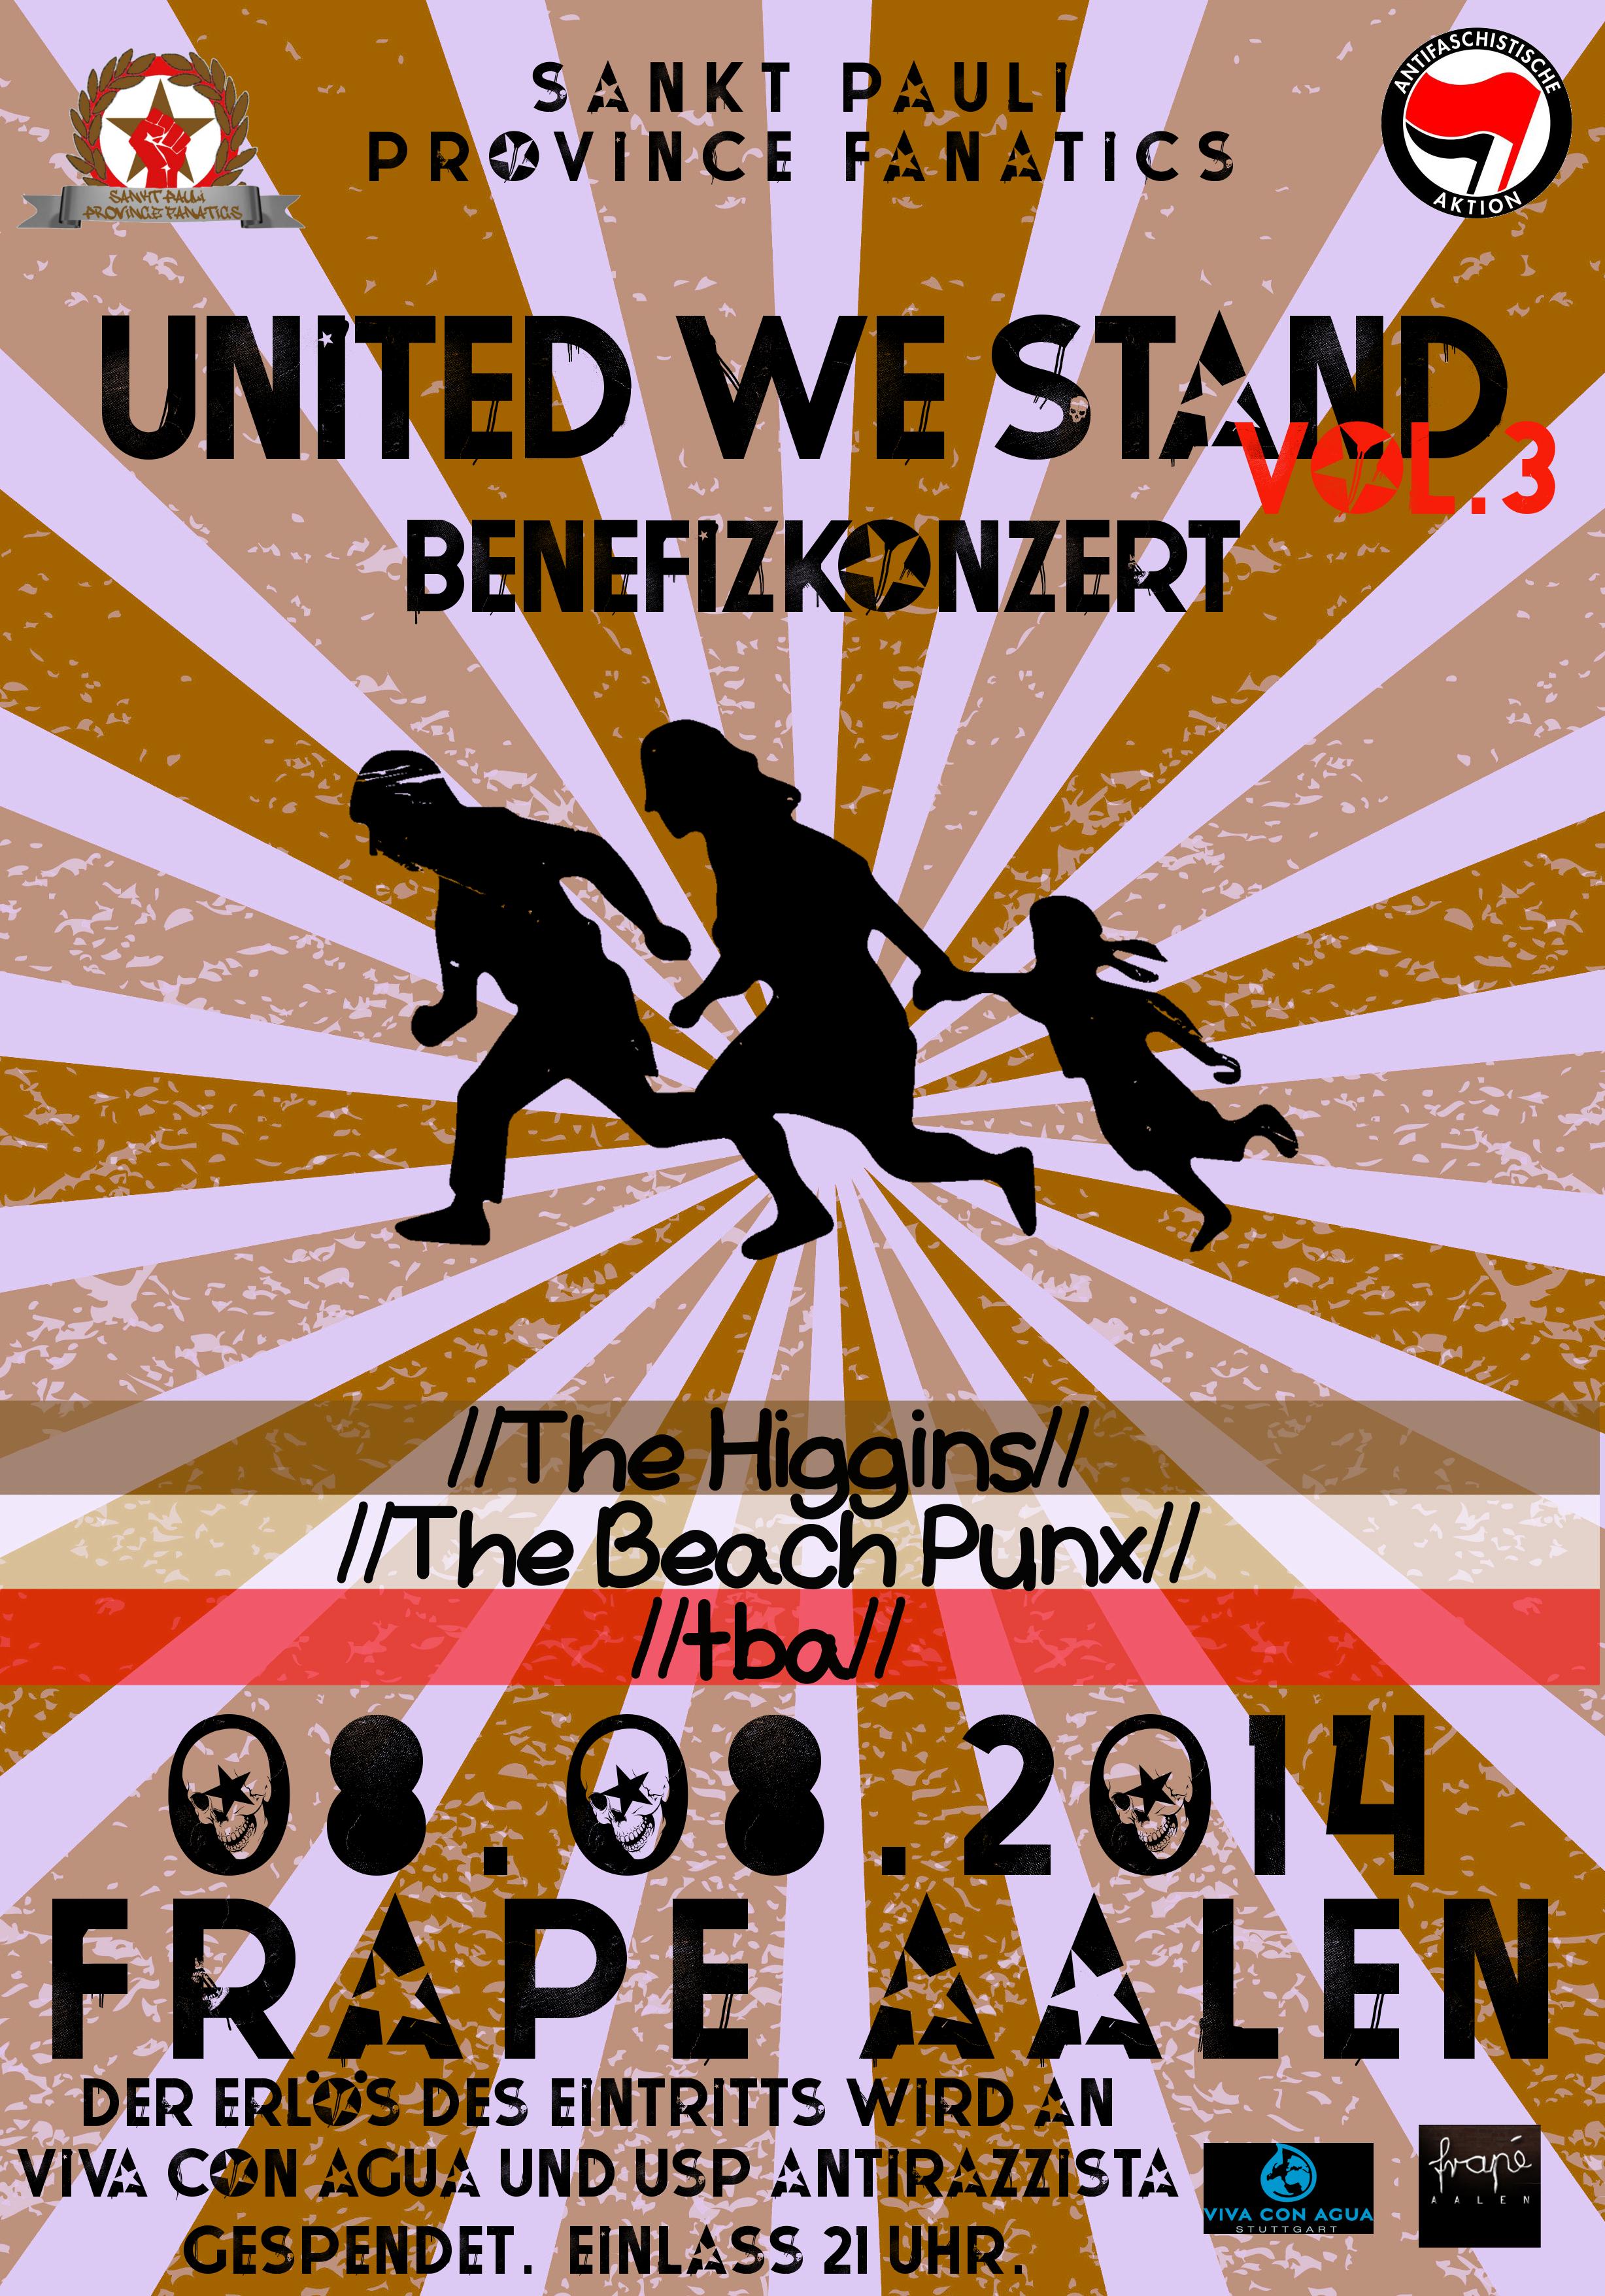 UnitedWeStandVol3